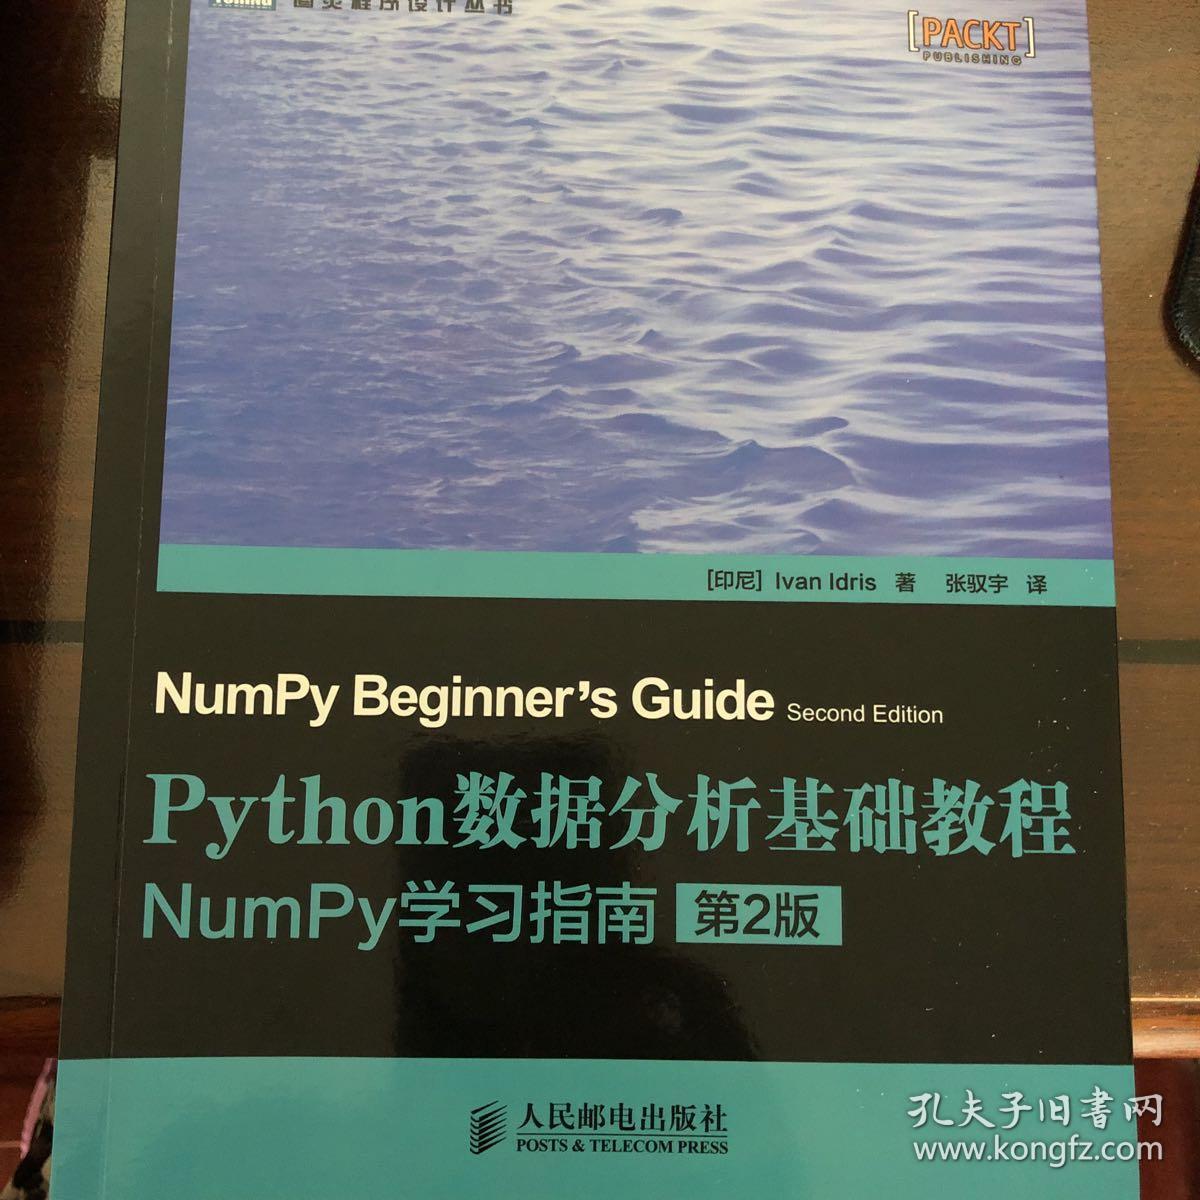 Python数据分析基础教程(第2版):NumPy学习指南